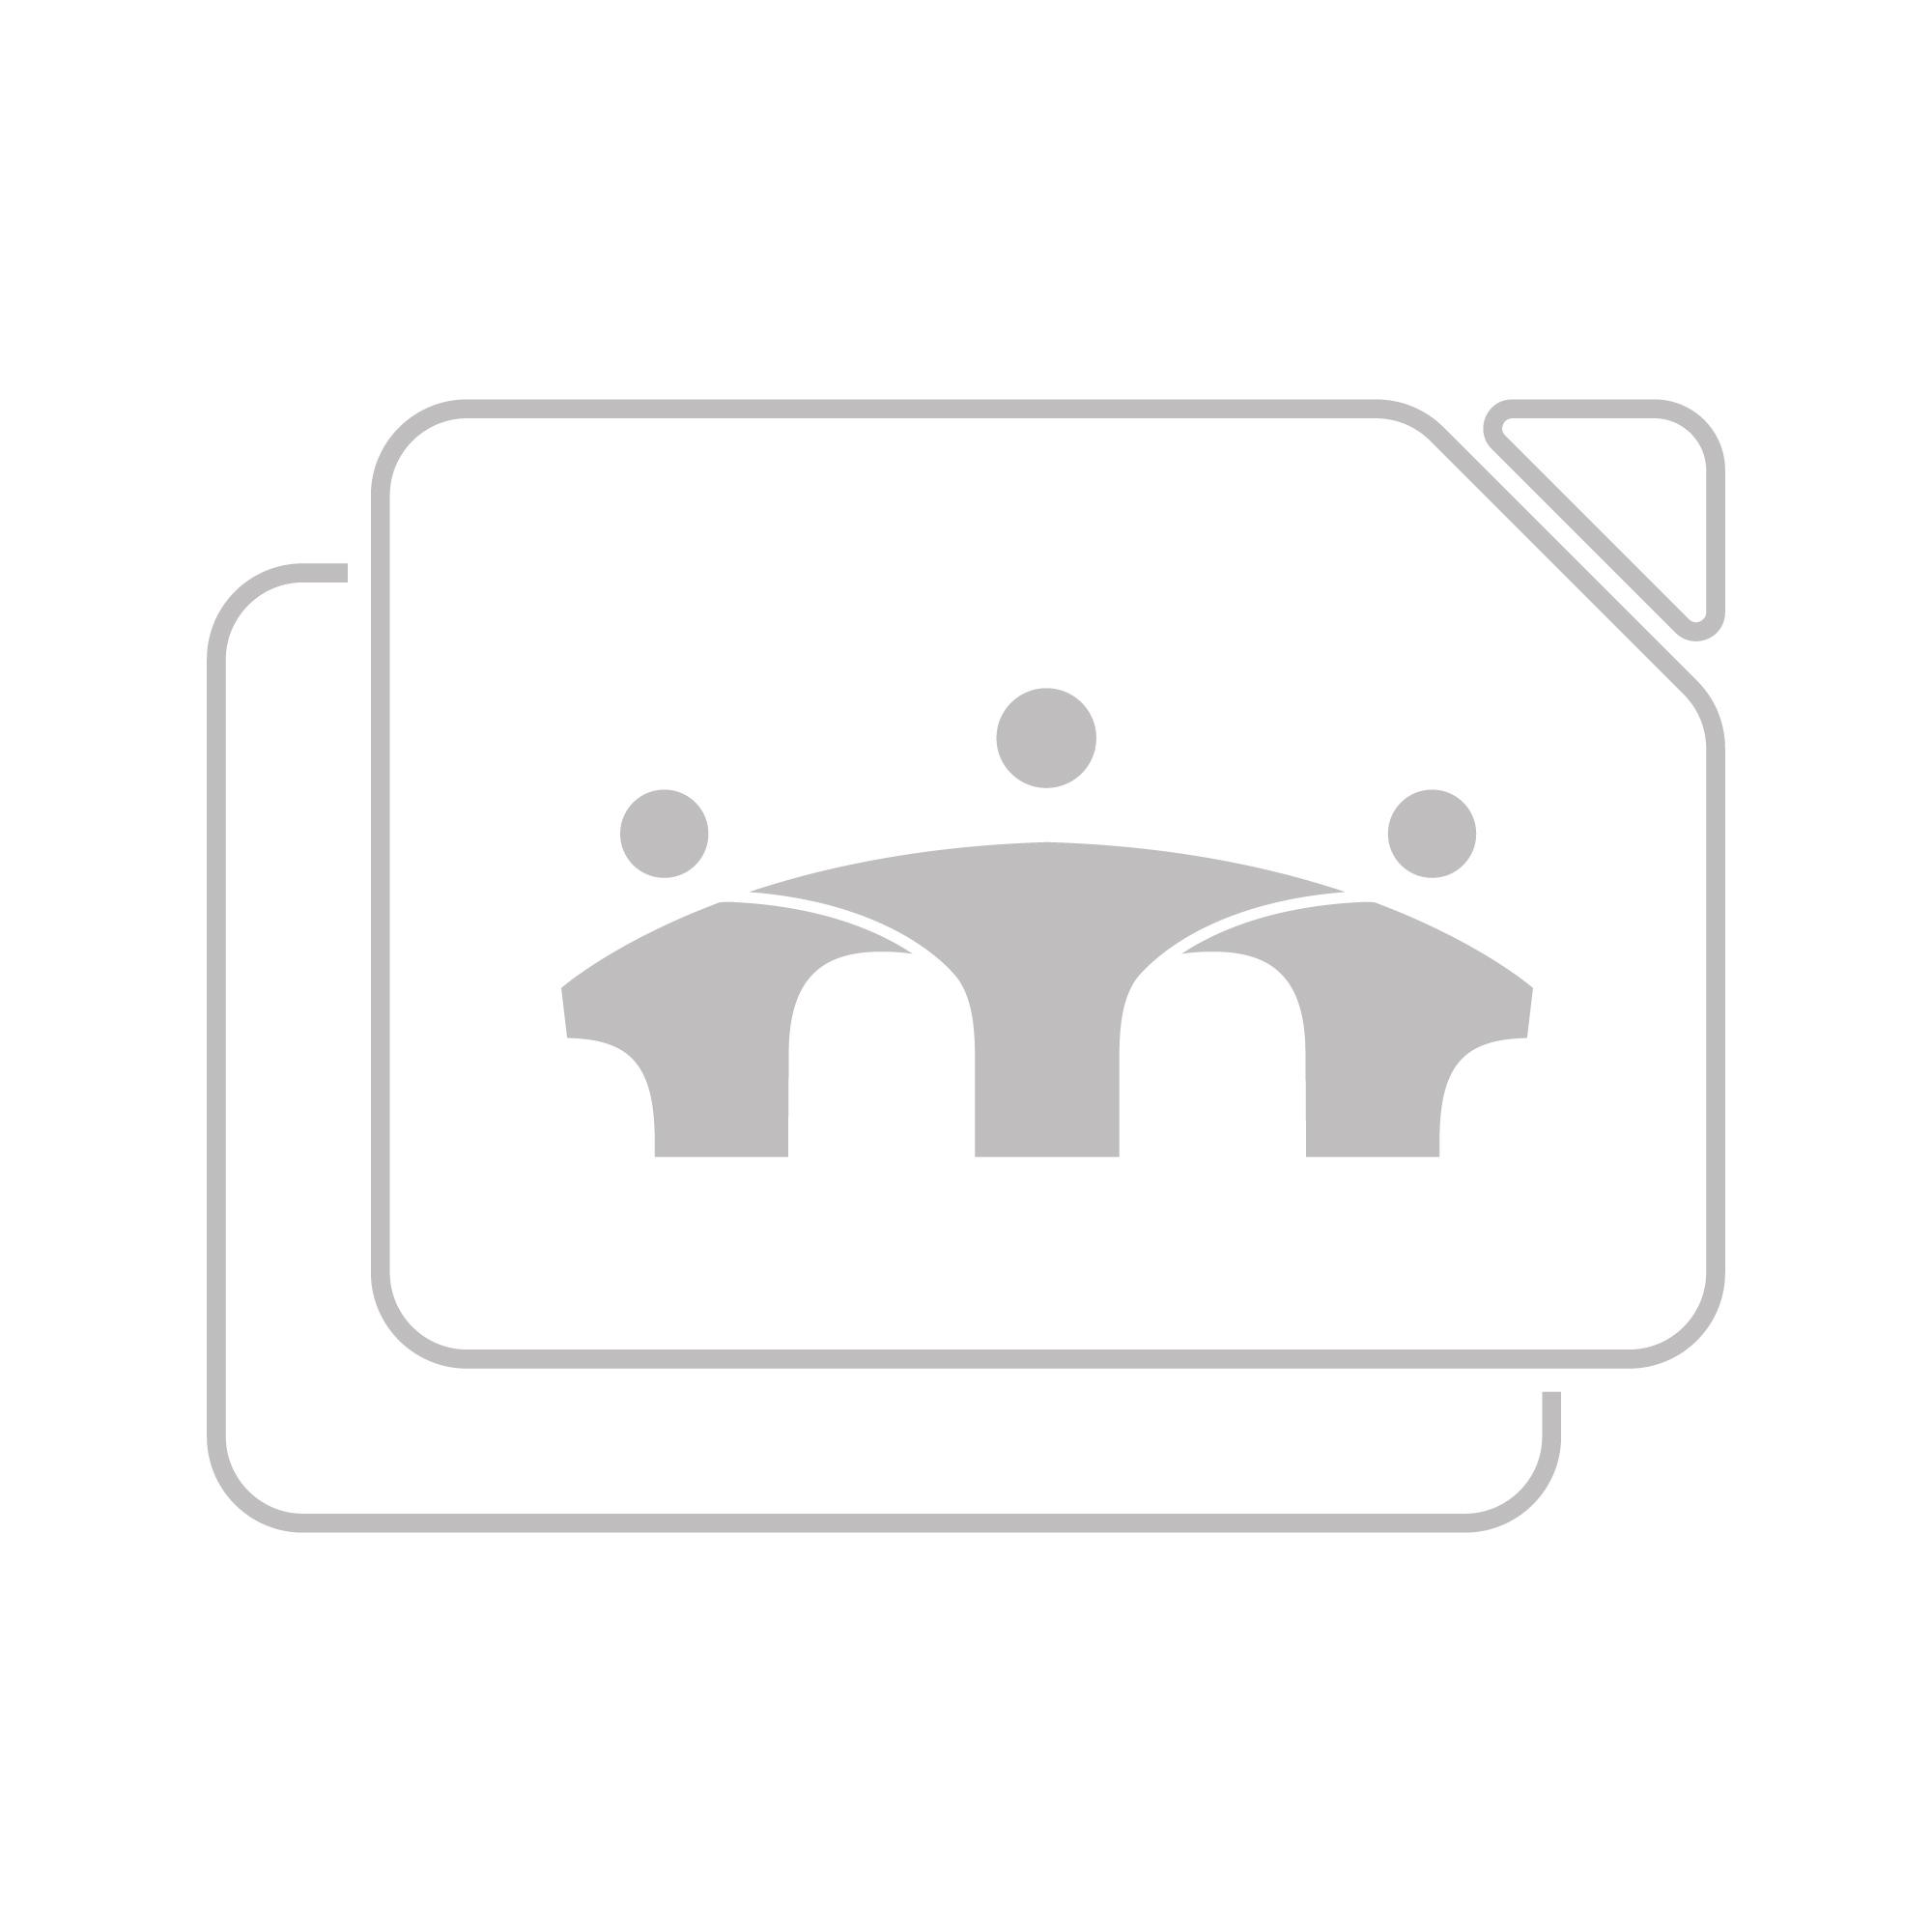 AMD Ryzen 7 PRO 5750G - 4.6GHz (Tray)